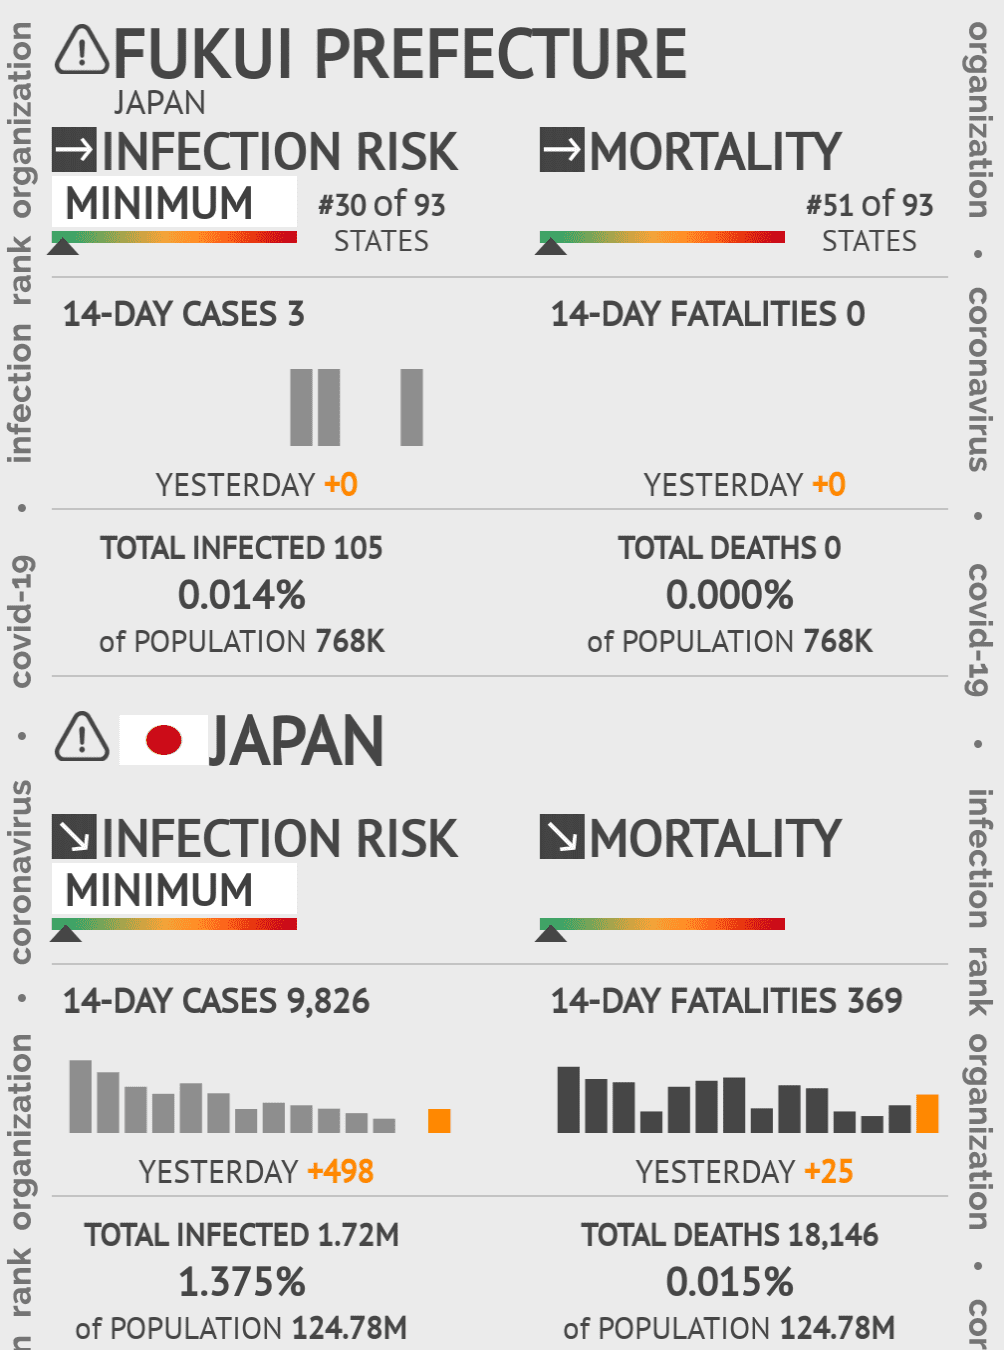 Fukui Prefecture Coronavirus Covid-19 Risk of Infection on May 14, 2020